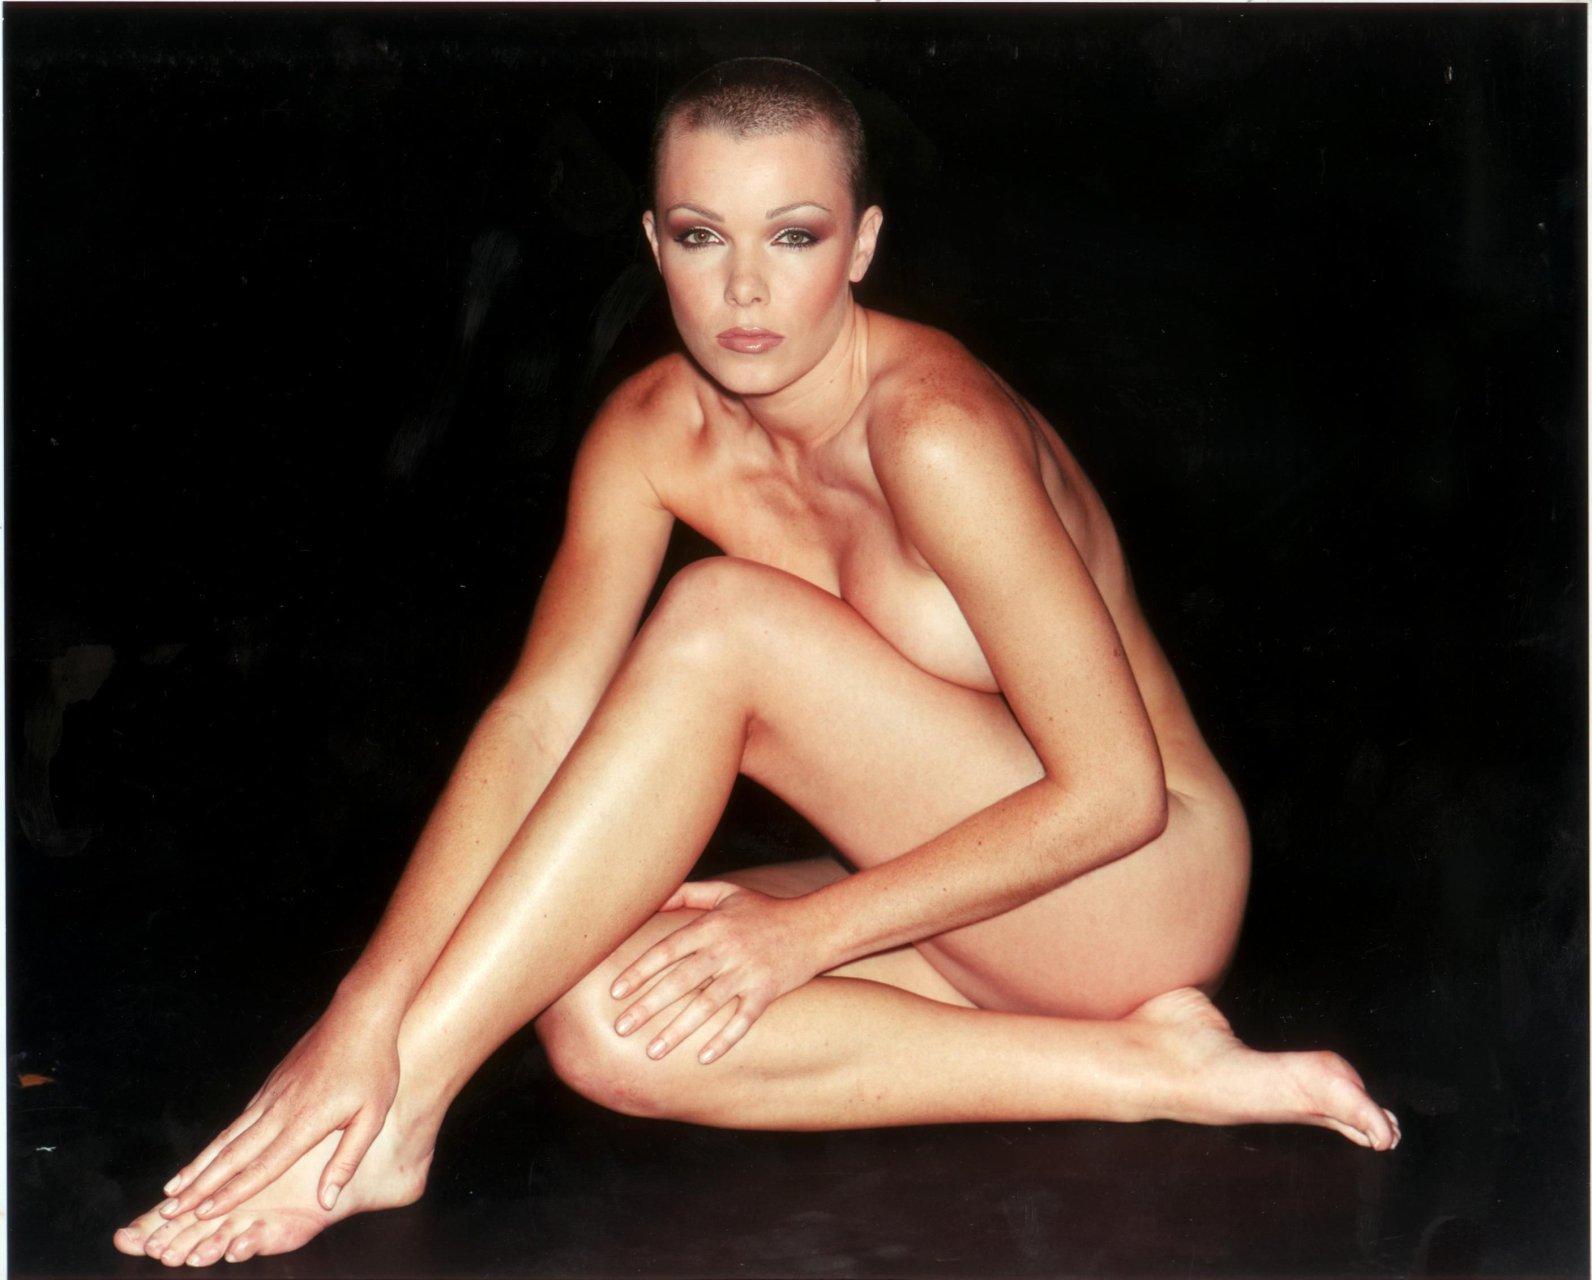 nude (58 photo), Paparazzi Celebrites picture